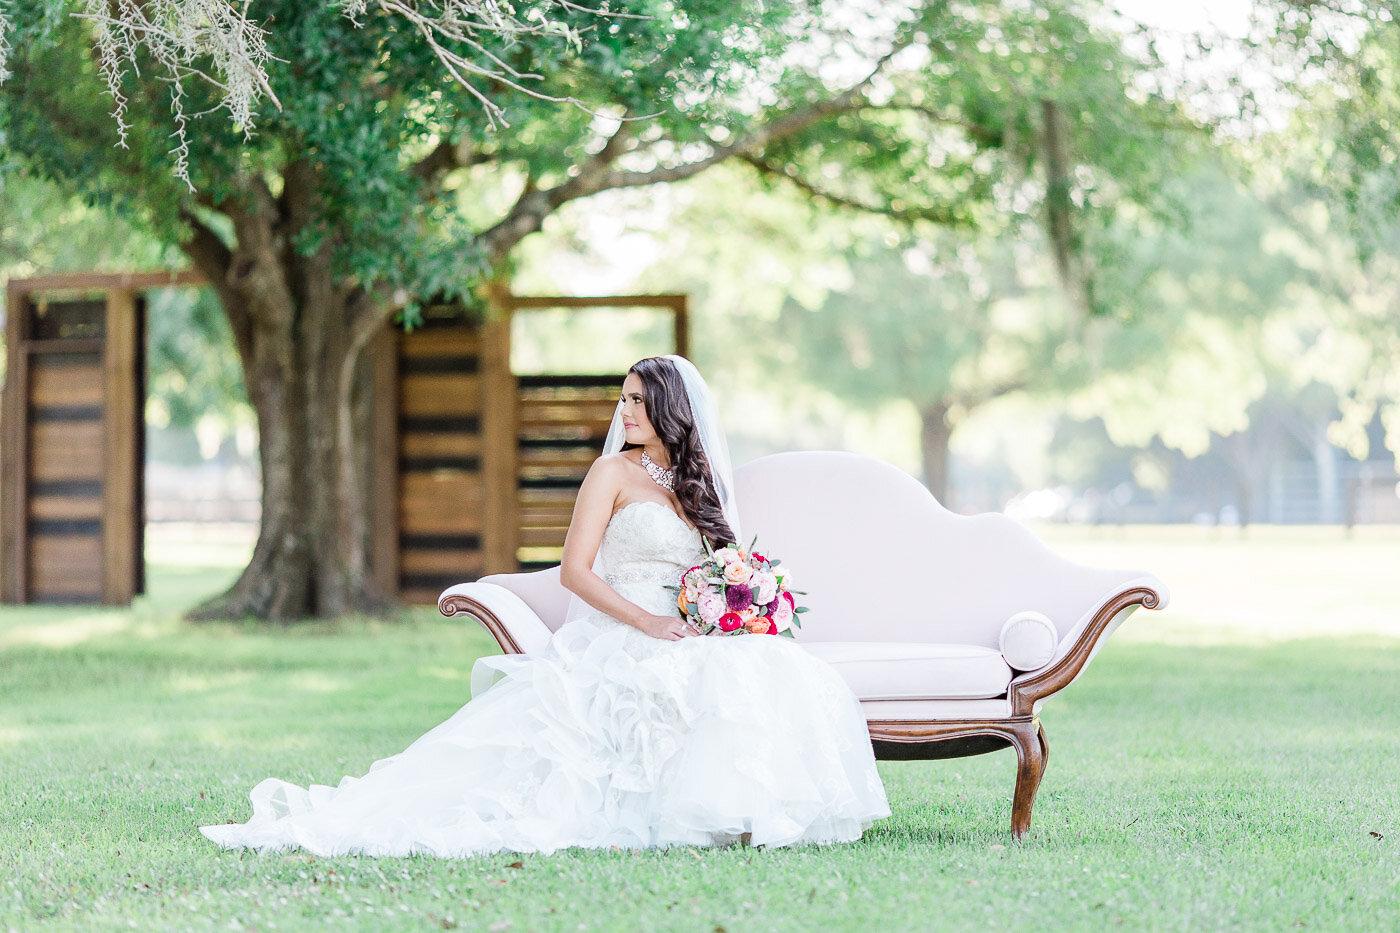 Lakeland-barn-wedding-at-white-horse-ranch-56.jpg